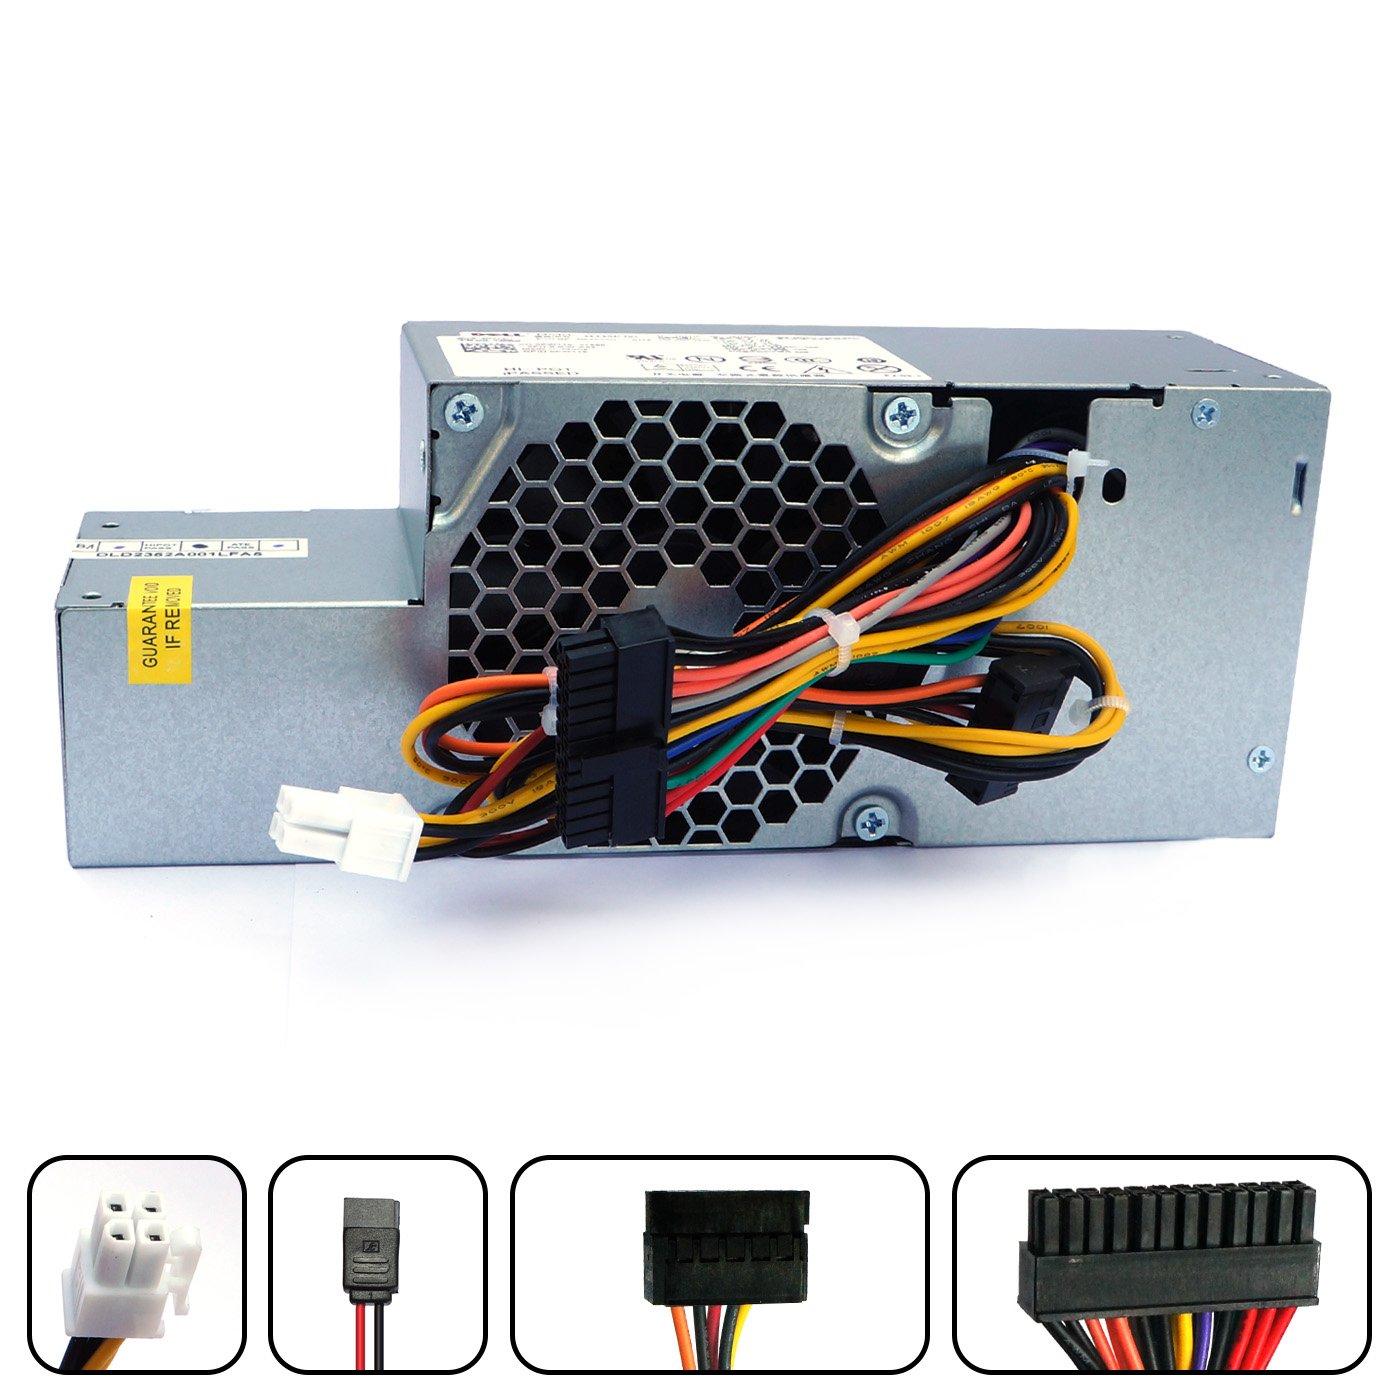 PW116 WU136 235W Desktop Power Supply For Dell Optiplex 760 780 960 980 Small Form Factor (SFF) Systems FR610 6RG54 MPF5F N6D7N RM112 67T67 R225M R224M H255T H235P-00 L235P-01 D235ES-00 F235E-00 by POINWER (Image #1)